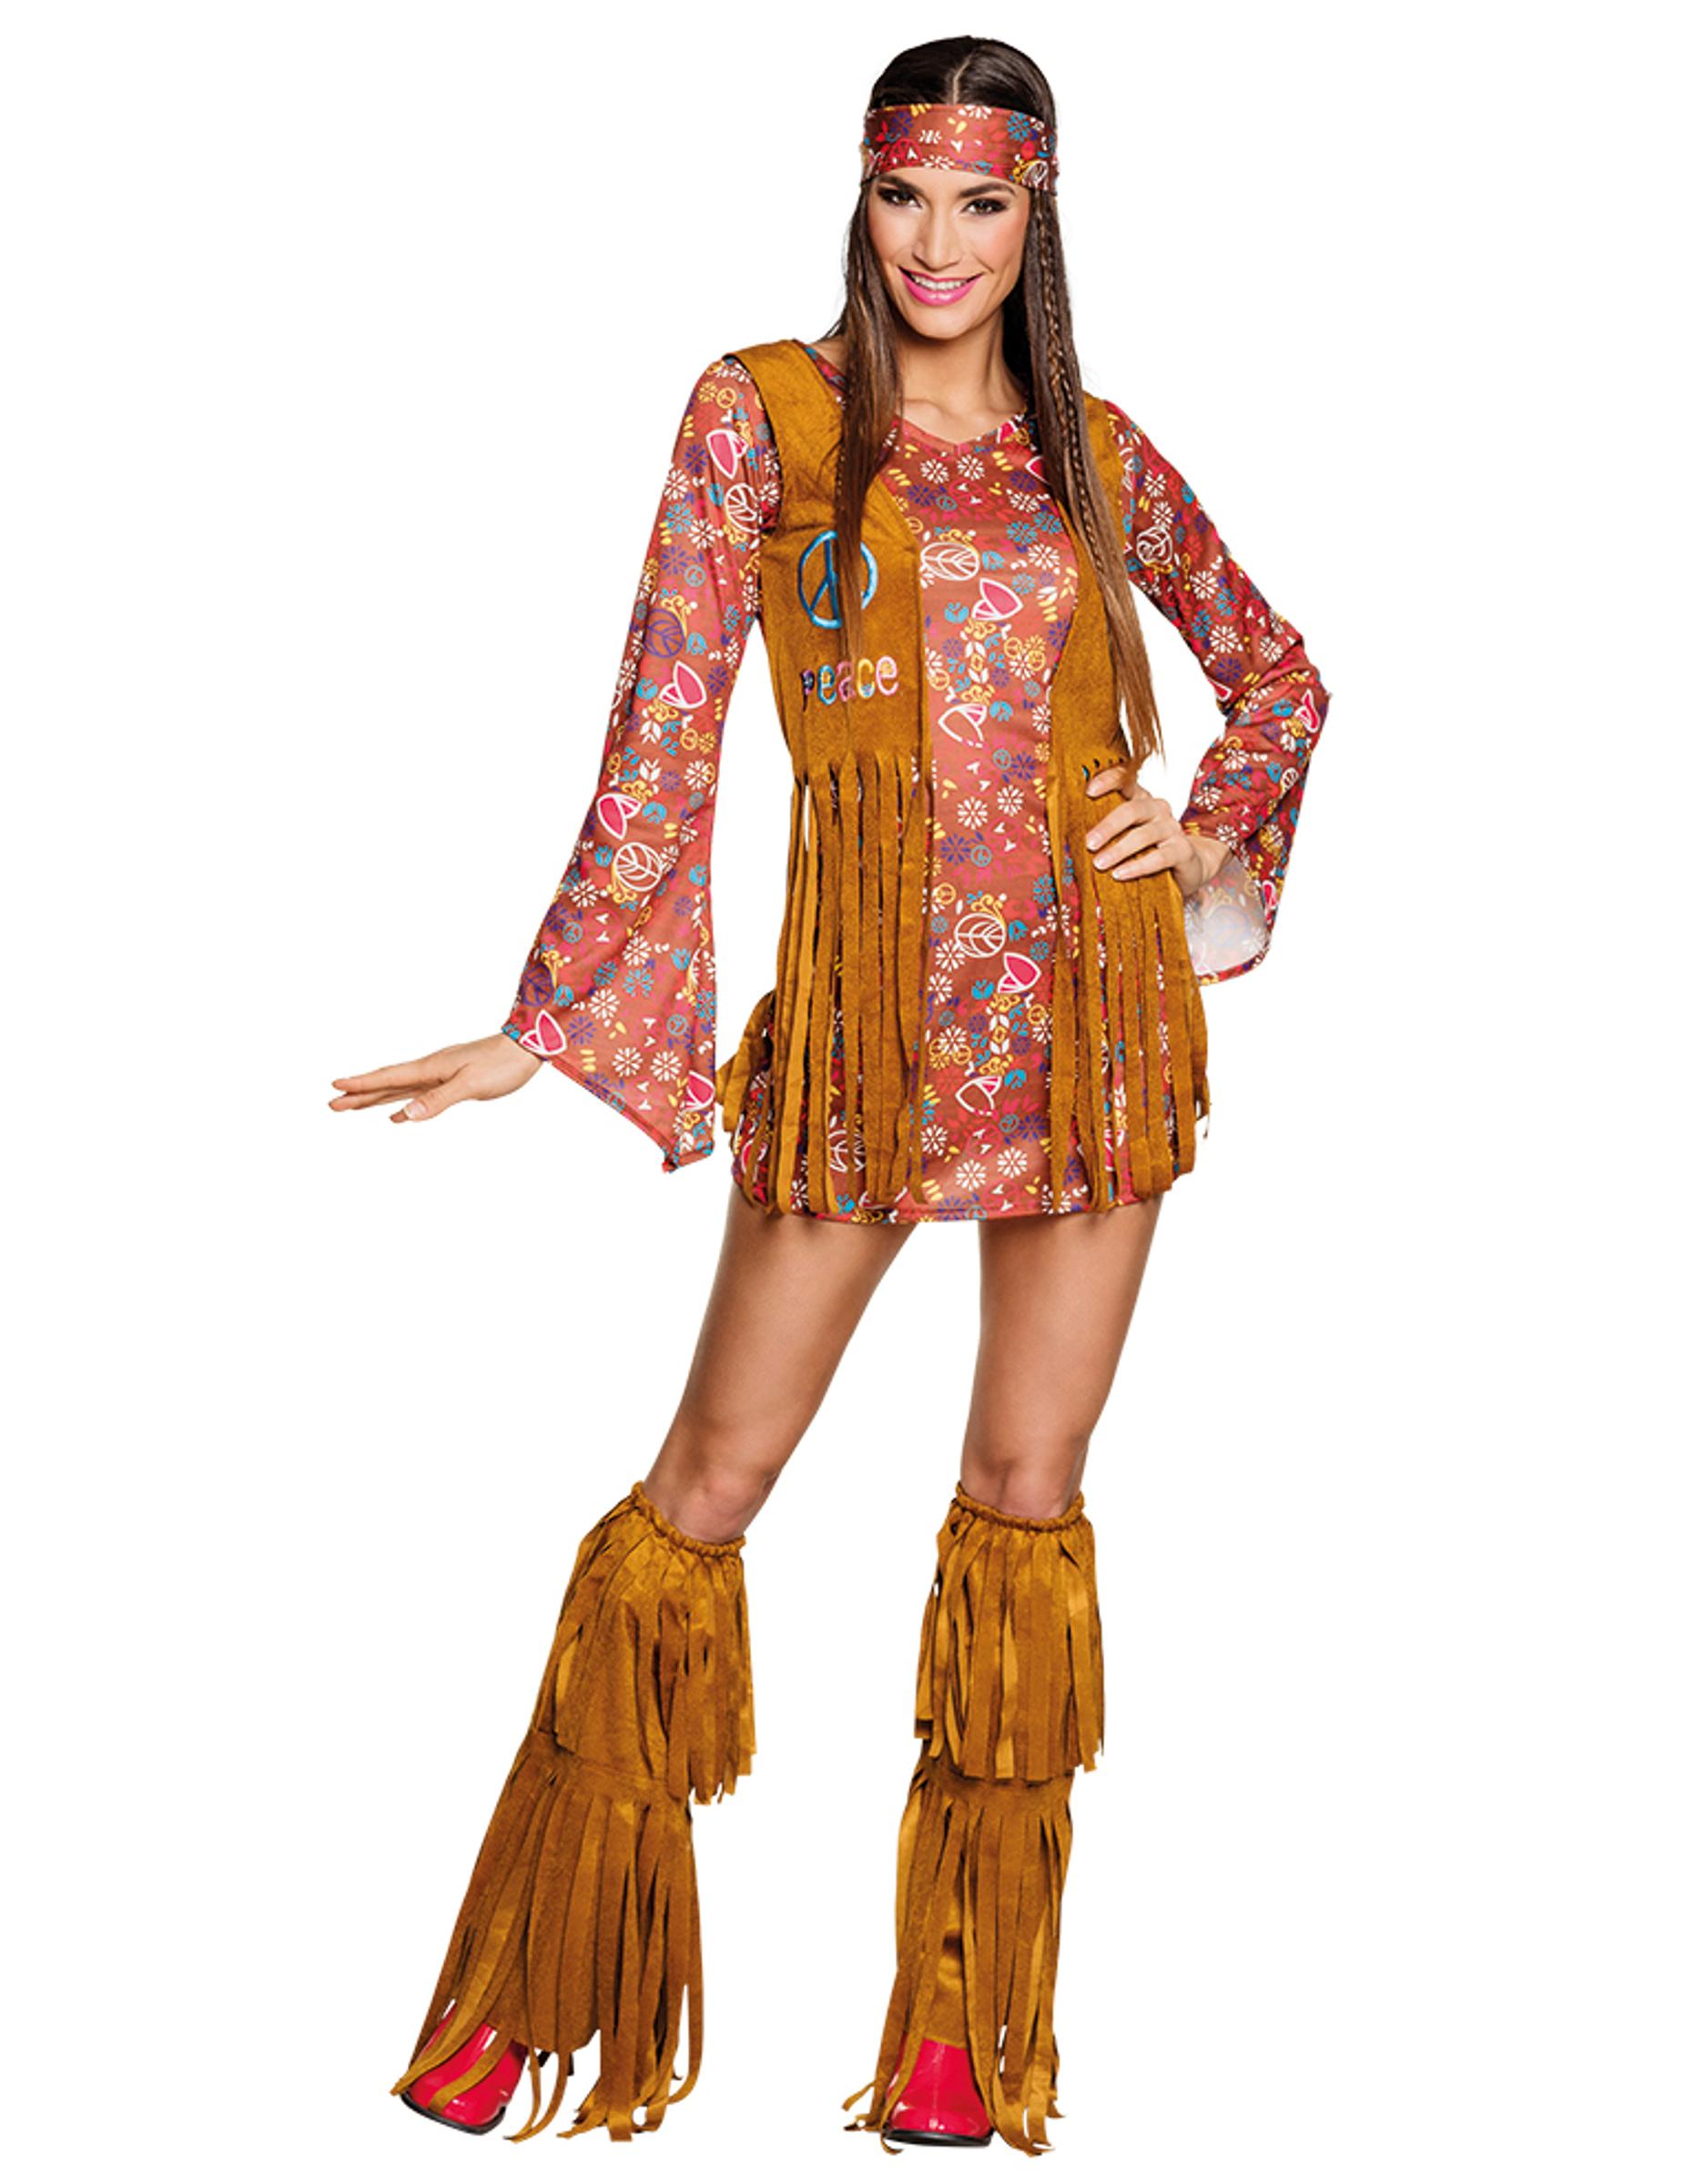 costume hippie a frange per donna costumi adulti e vestiti di carnevale online vegaoo. Black Bedroom Furniture Sets. Home Design Ideas